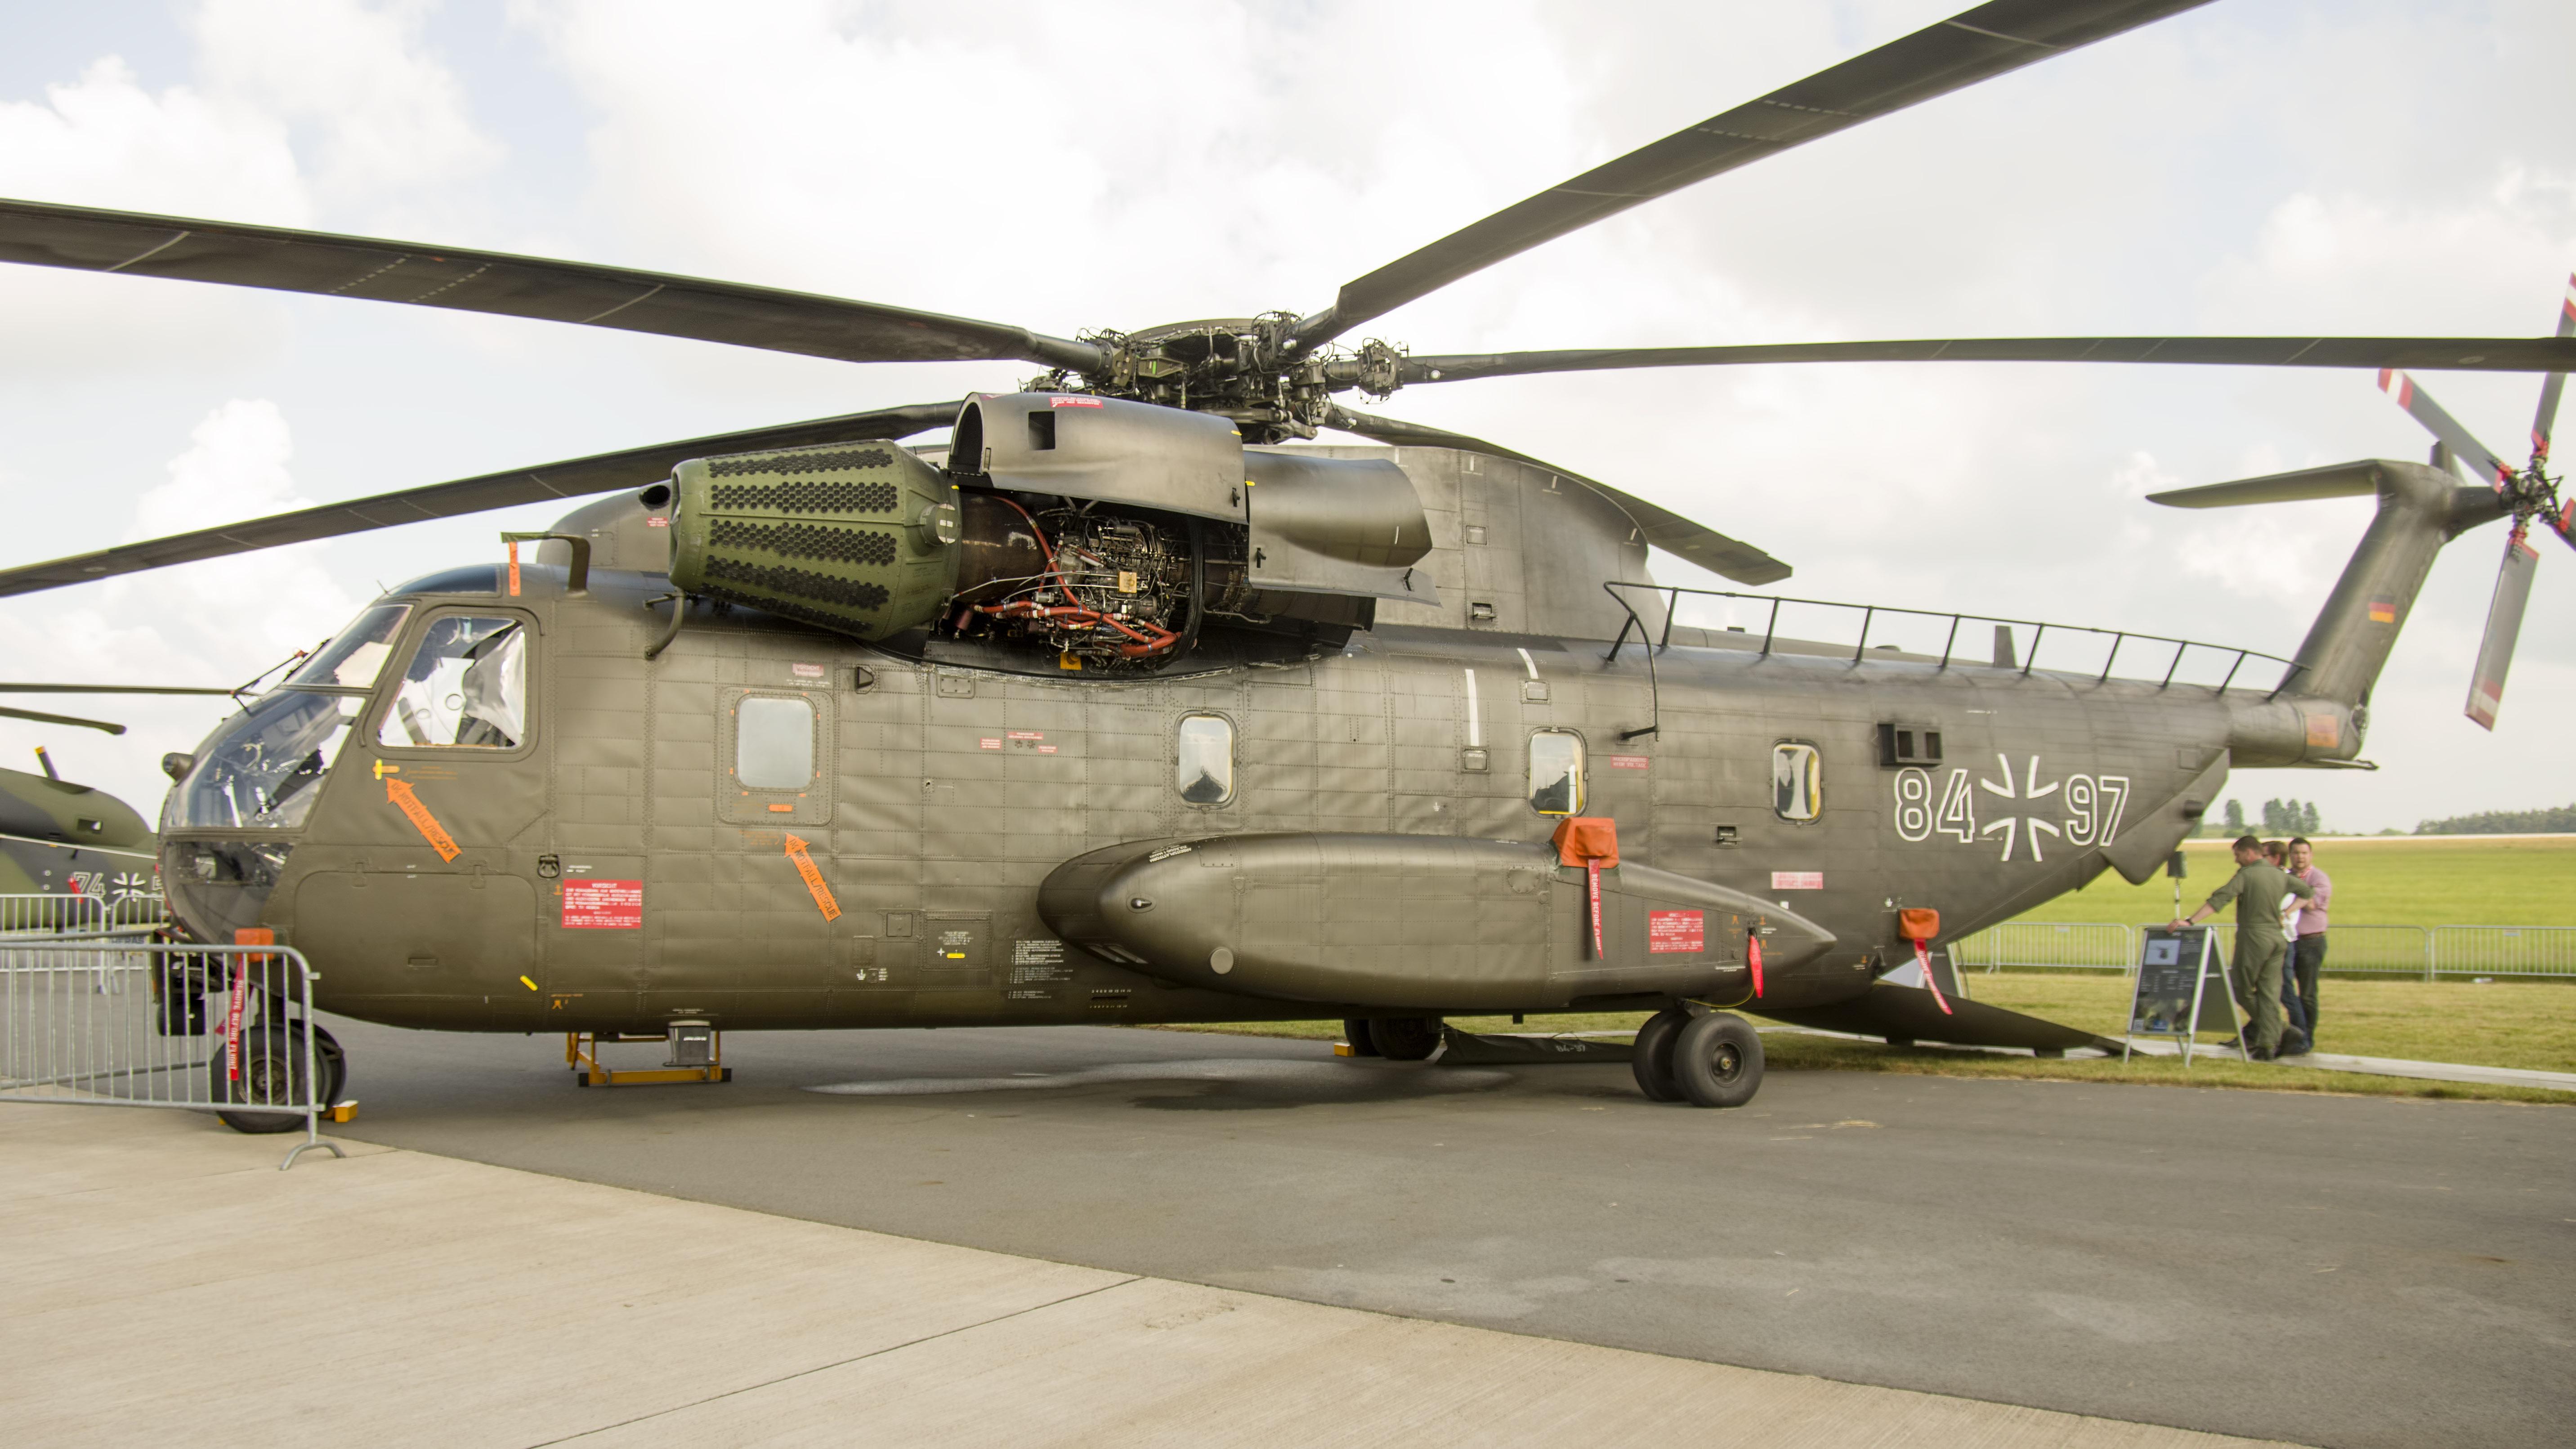 _IMG2263 Sikorsky VFW-Fokker CH-53G S-65C-1 84+97 German army